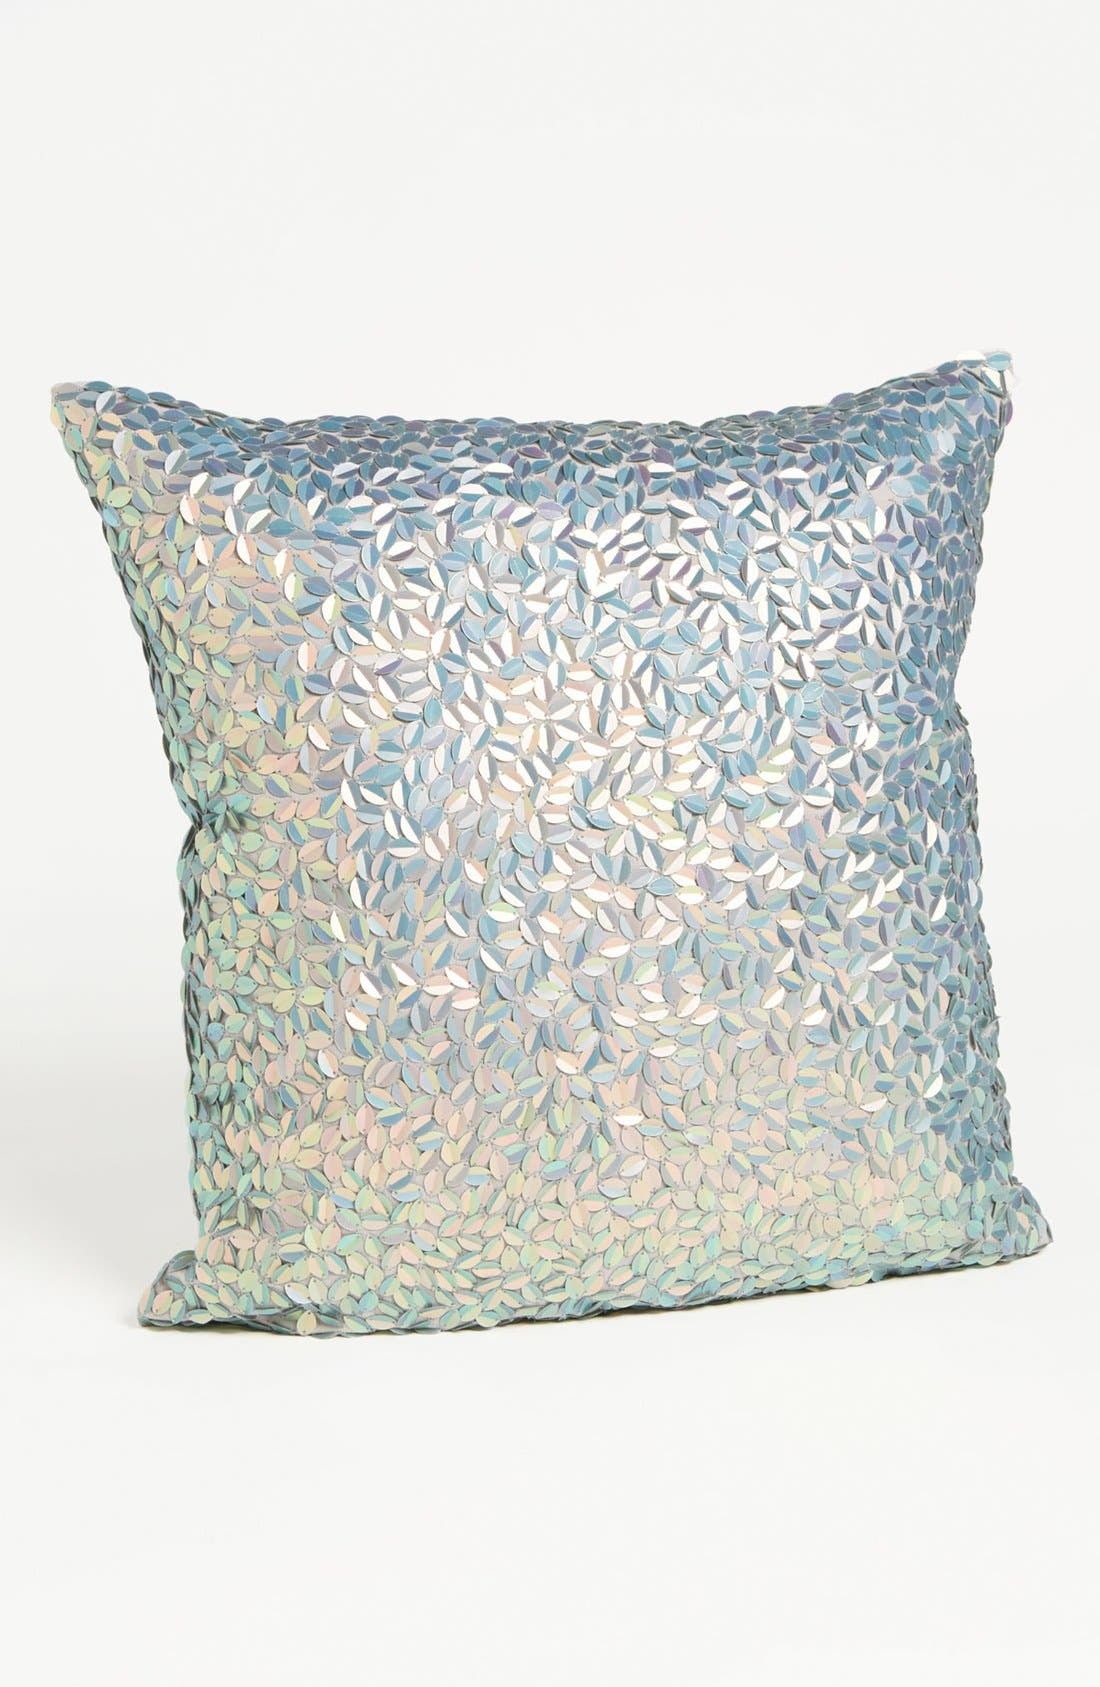 Alternate Image 1 Selected - Nordstrom at Home 'Cristobal' Pillow